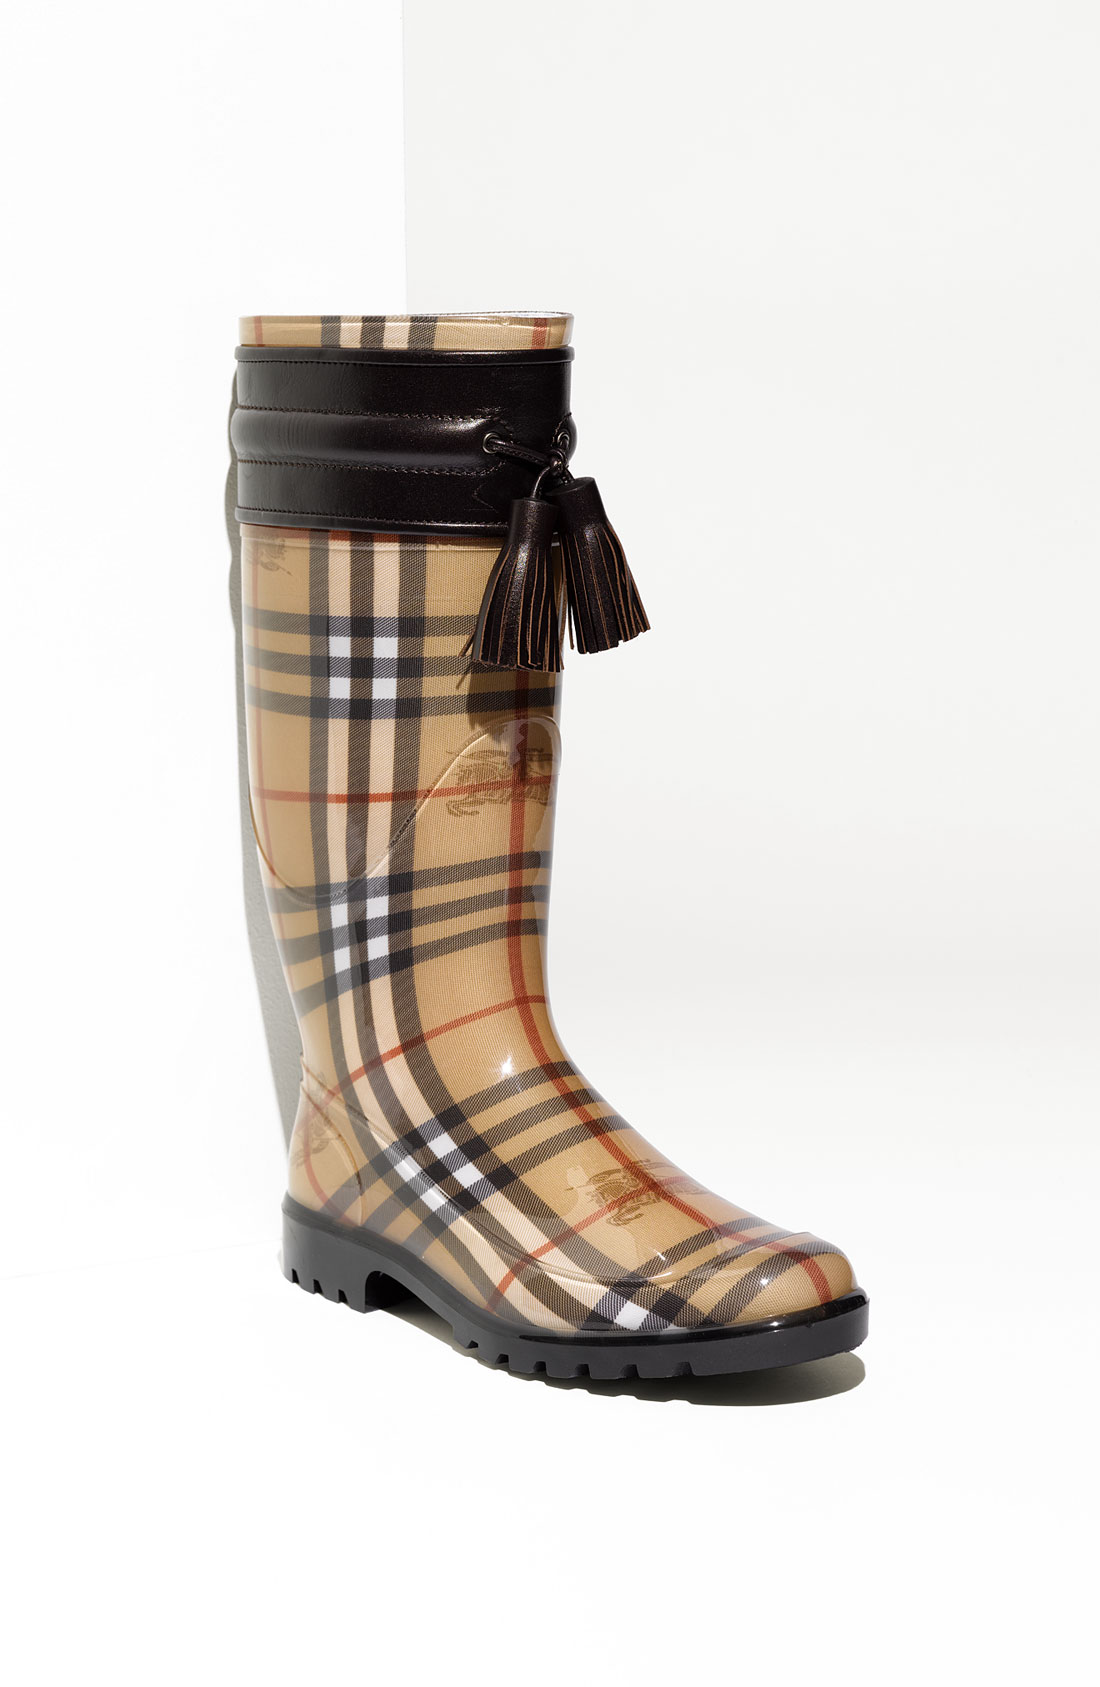 burberry leather trim rain boot in brown dark chocolate